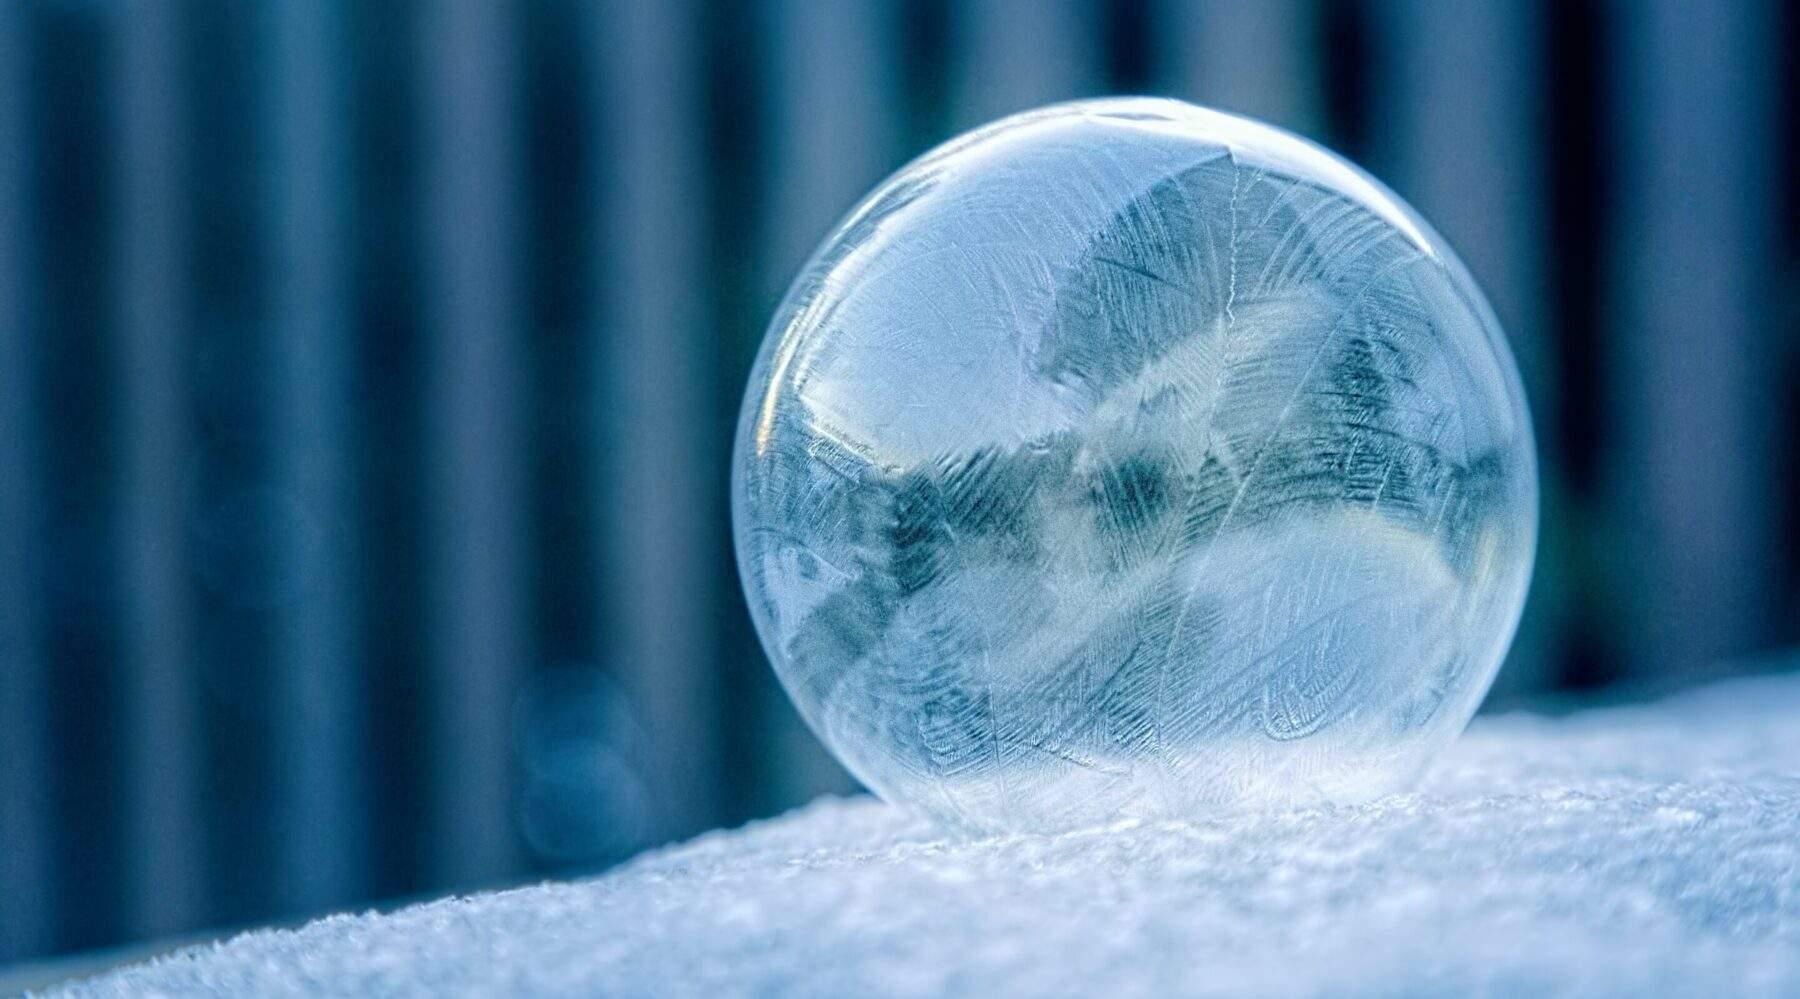 glassball scaled e1622146846719